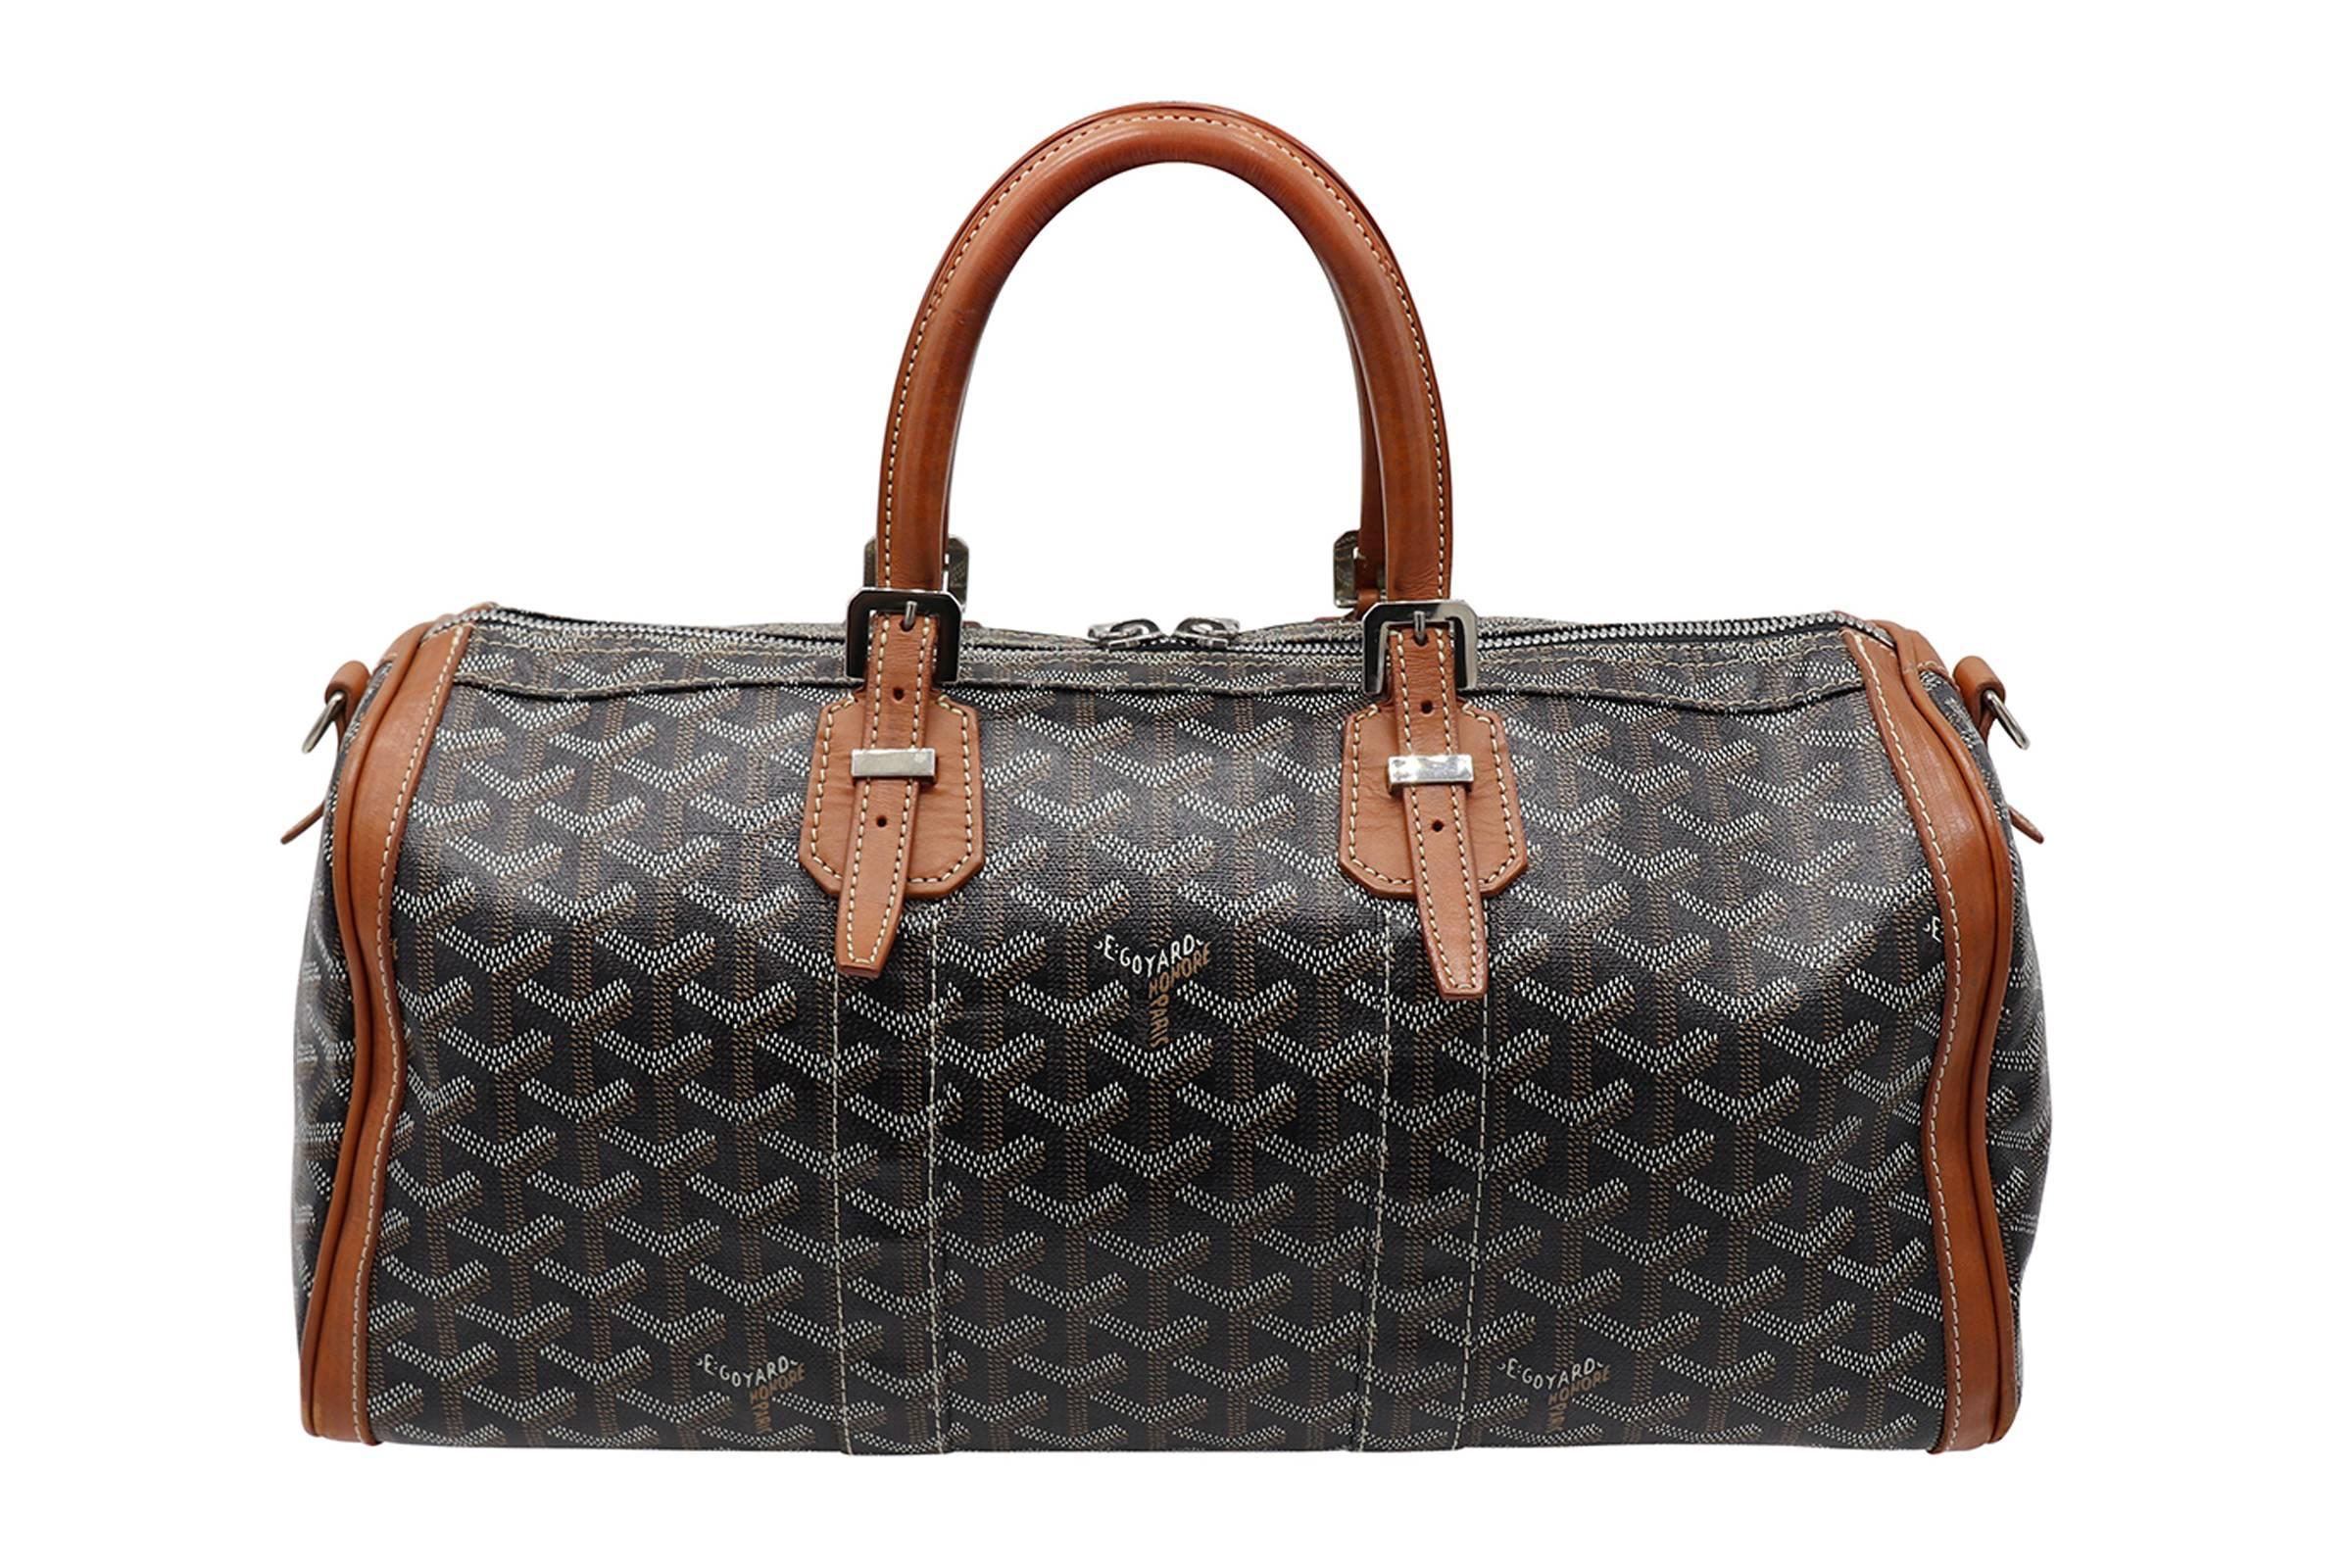 Goyard Croisiere 40 Bag